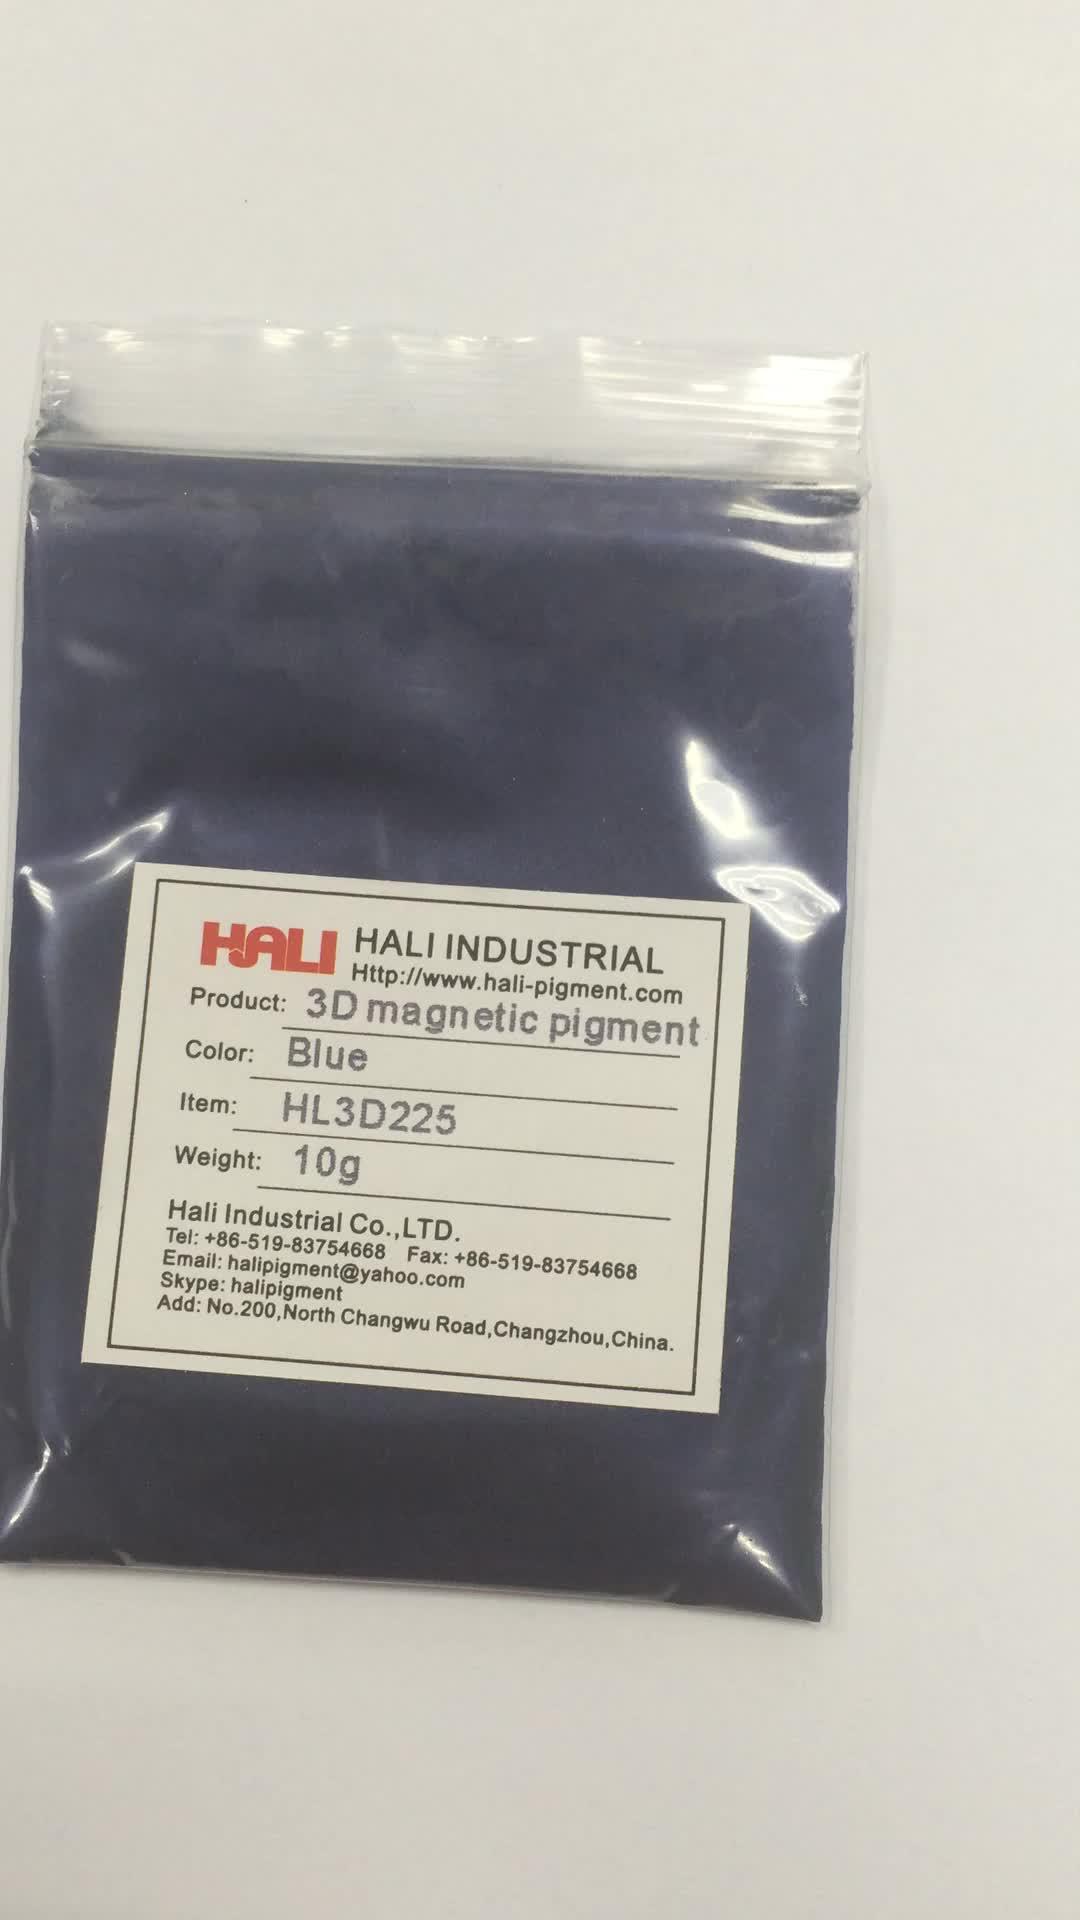 3d magnetic pigment,cat eye magic powder,stereoscopic effect,item:HL3D225,color:blue